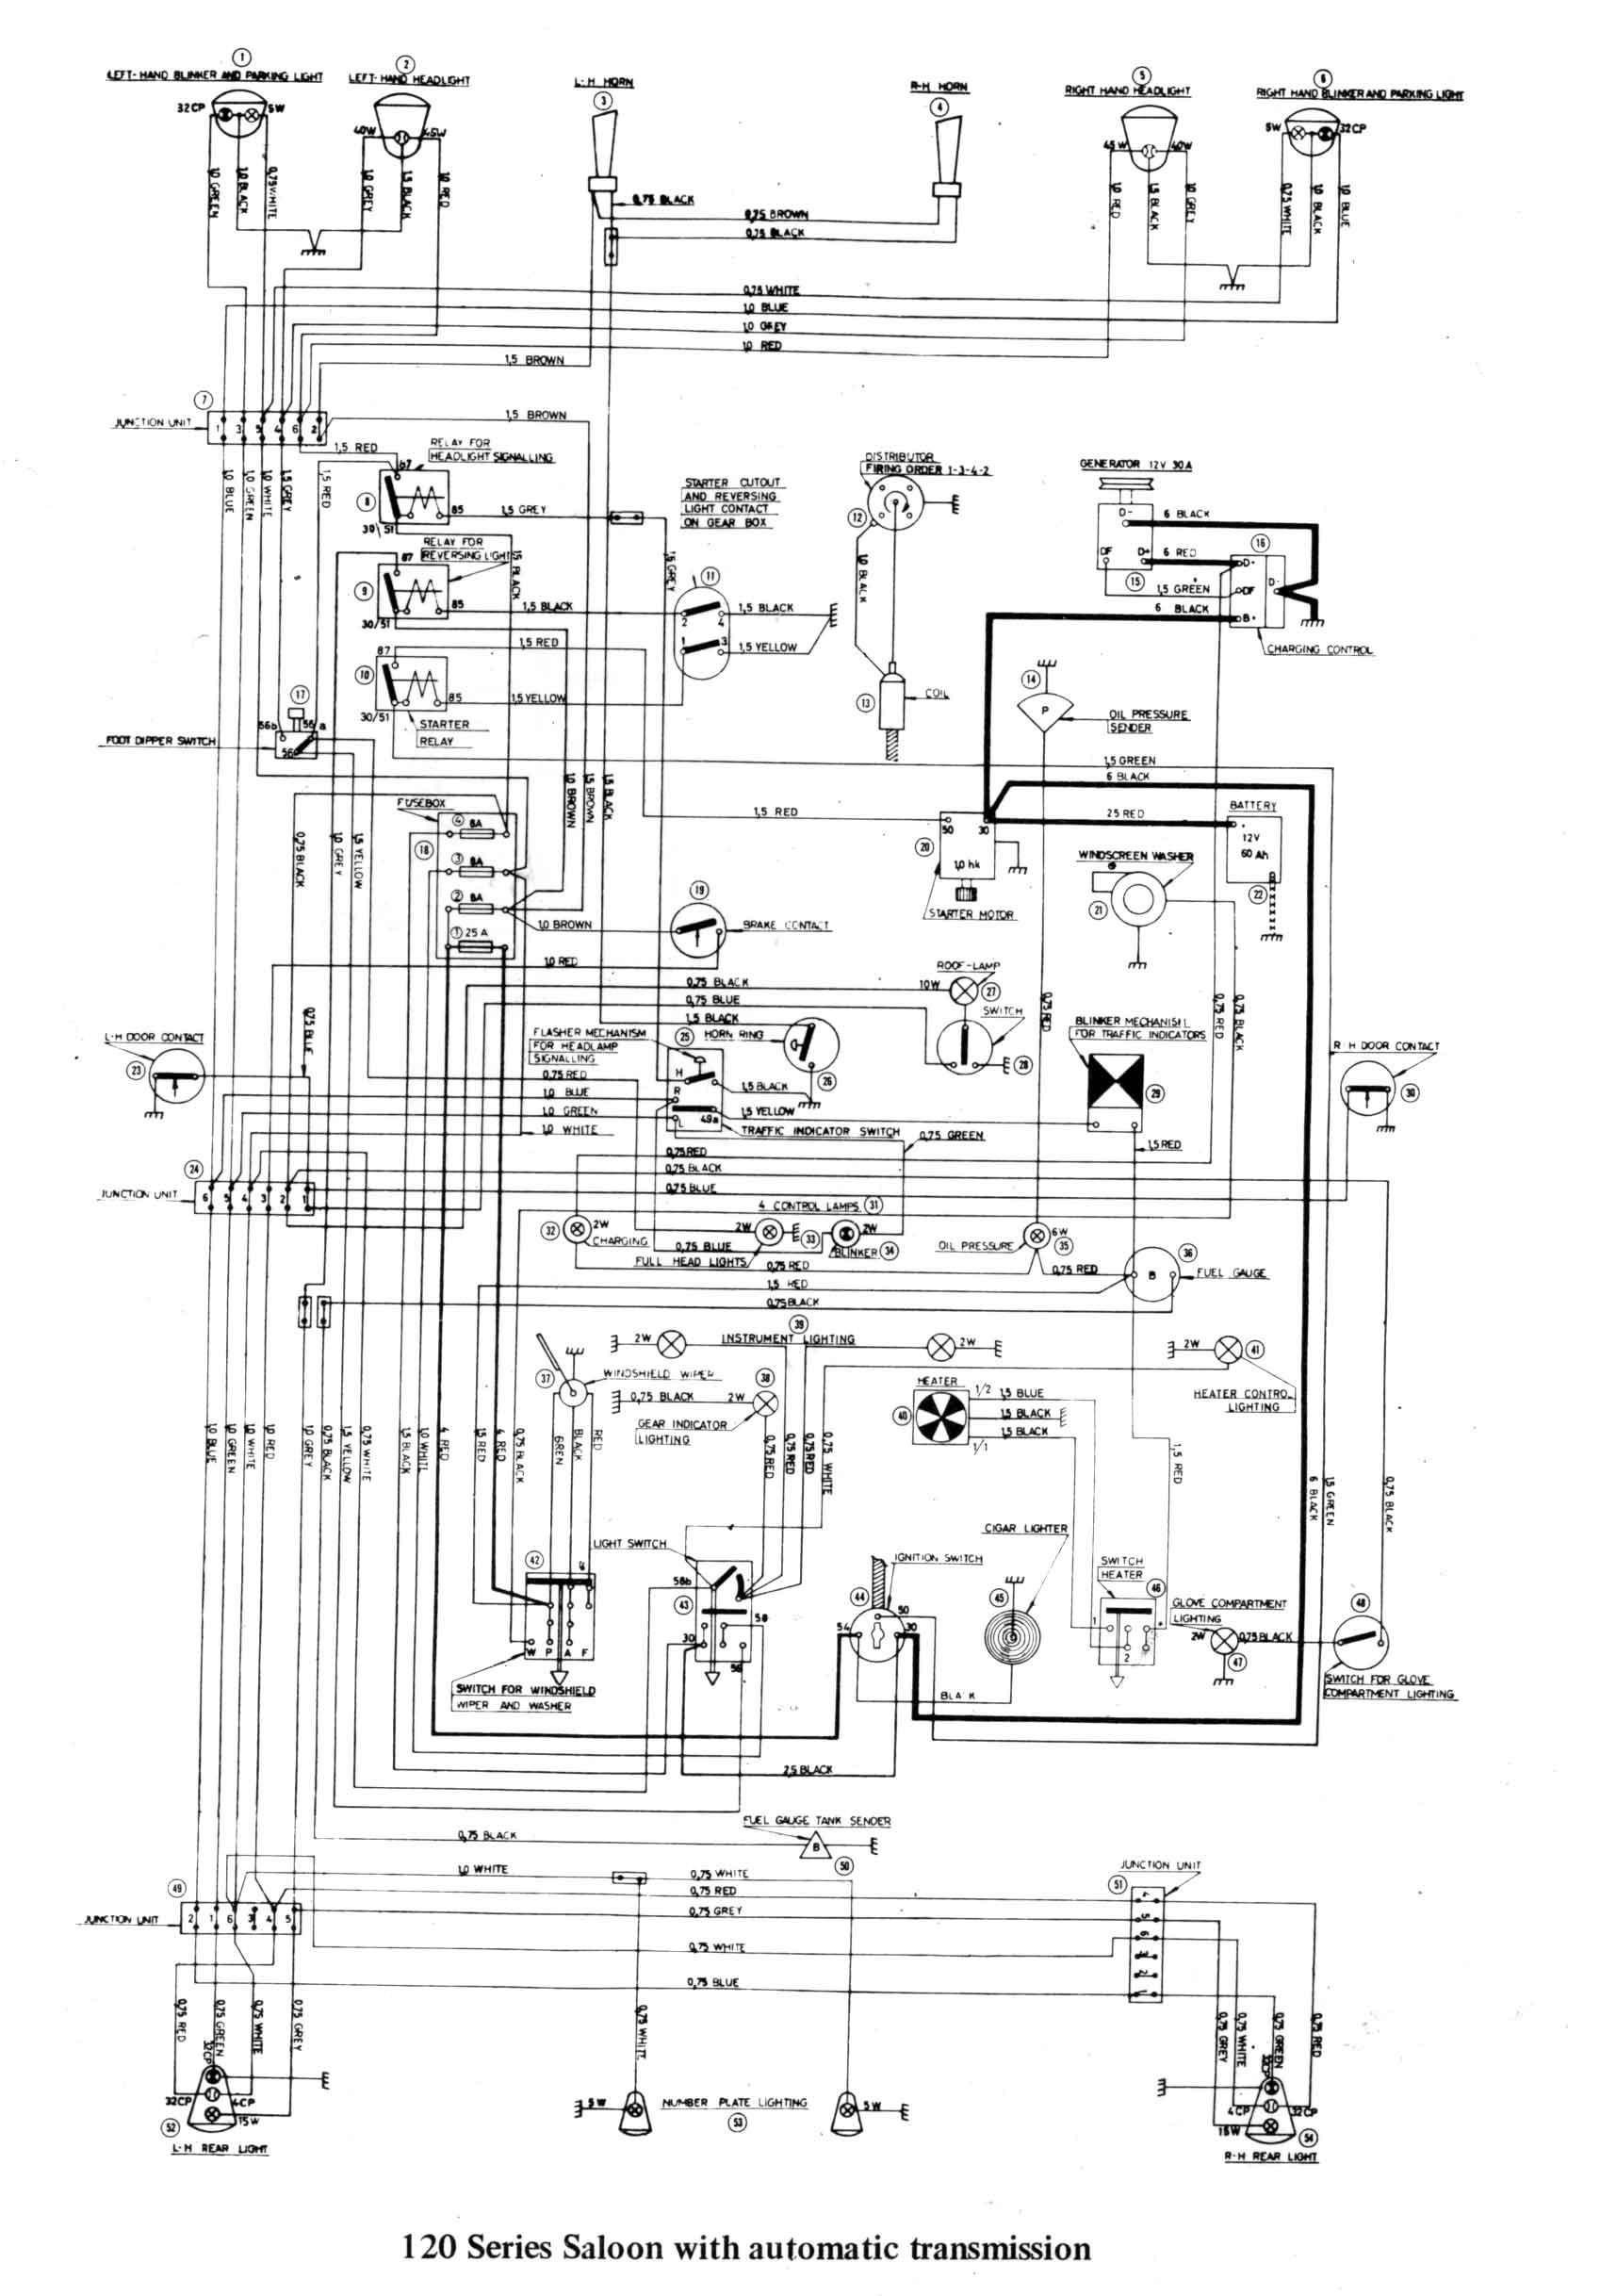 Headlight Wiring Diagram Awesome Sw Em Od Retrofitting A Vintage Volvo